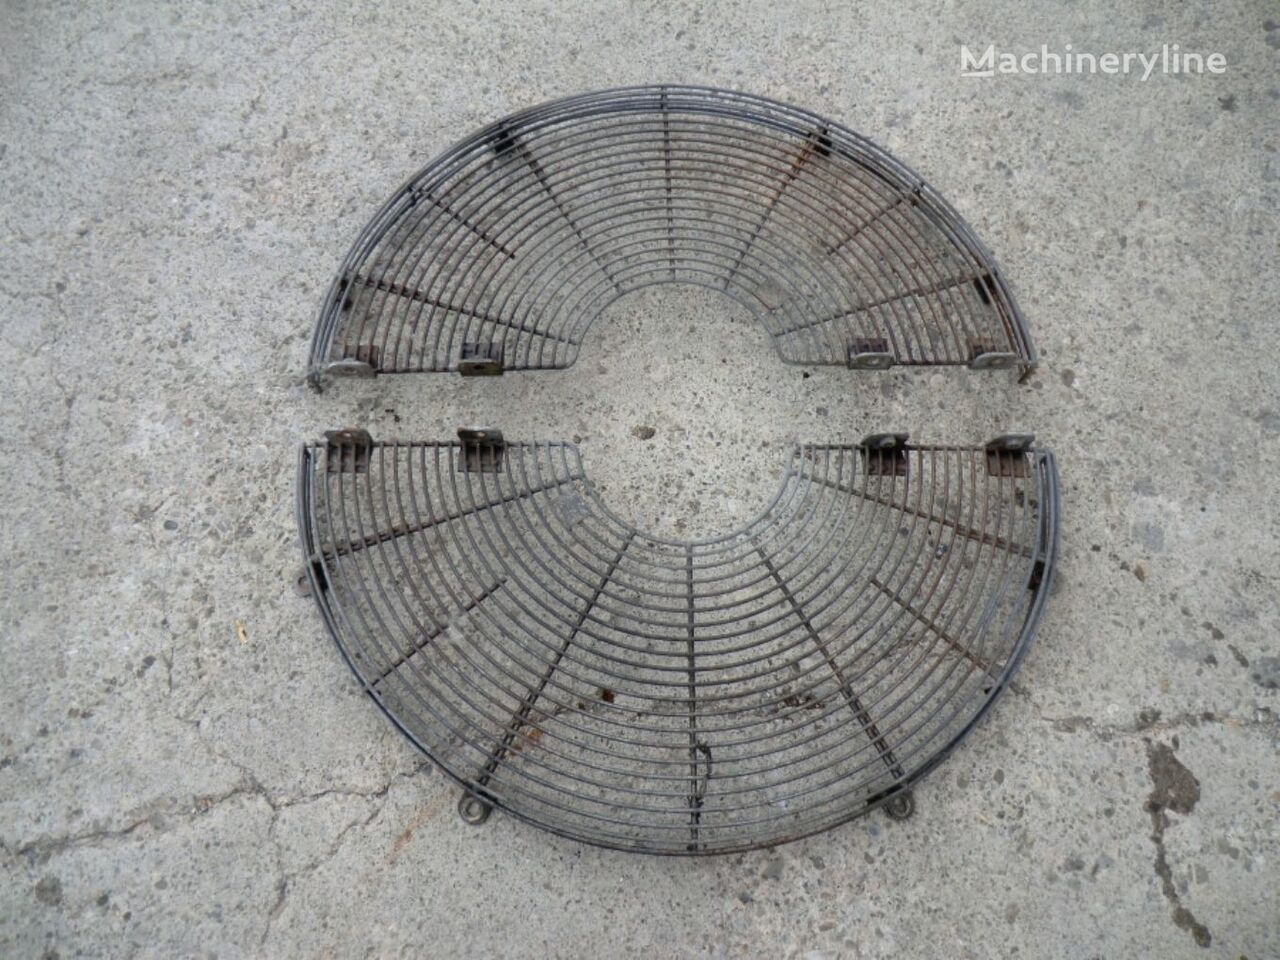 GUARD AS FAN radiator grille for CATERPILLAR 963C 2DS01270 wheel loader